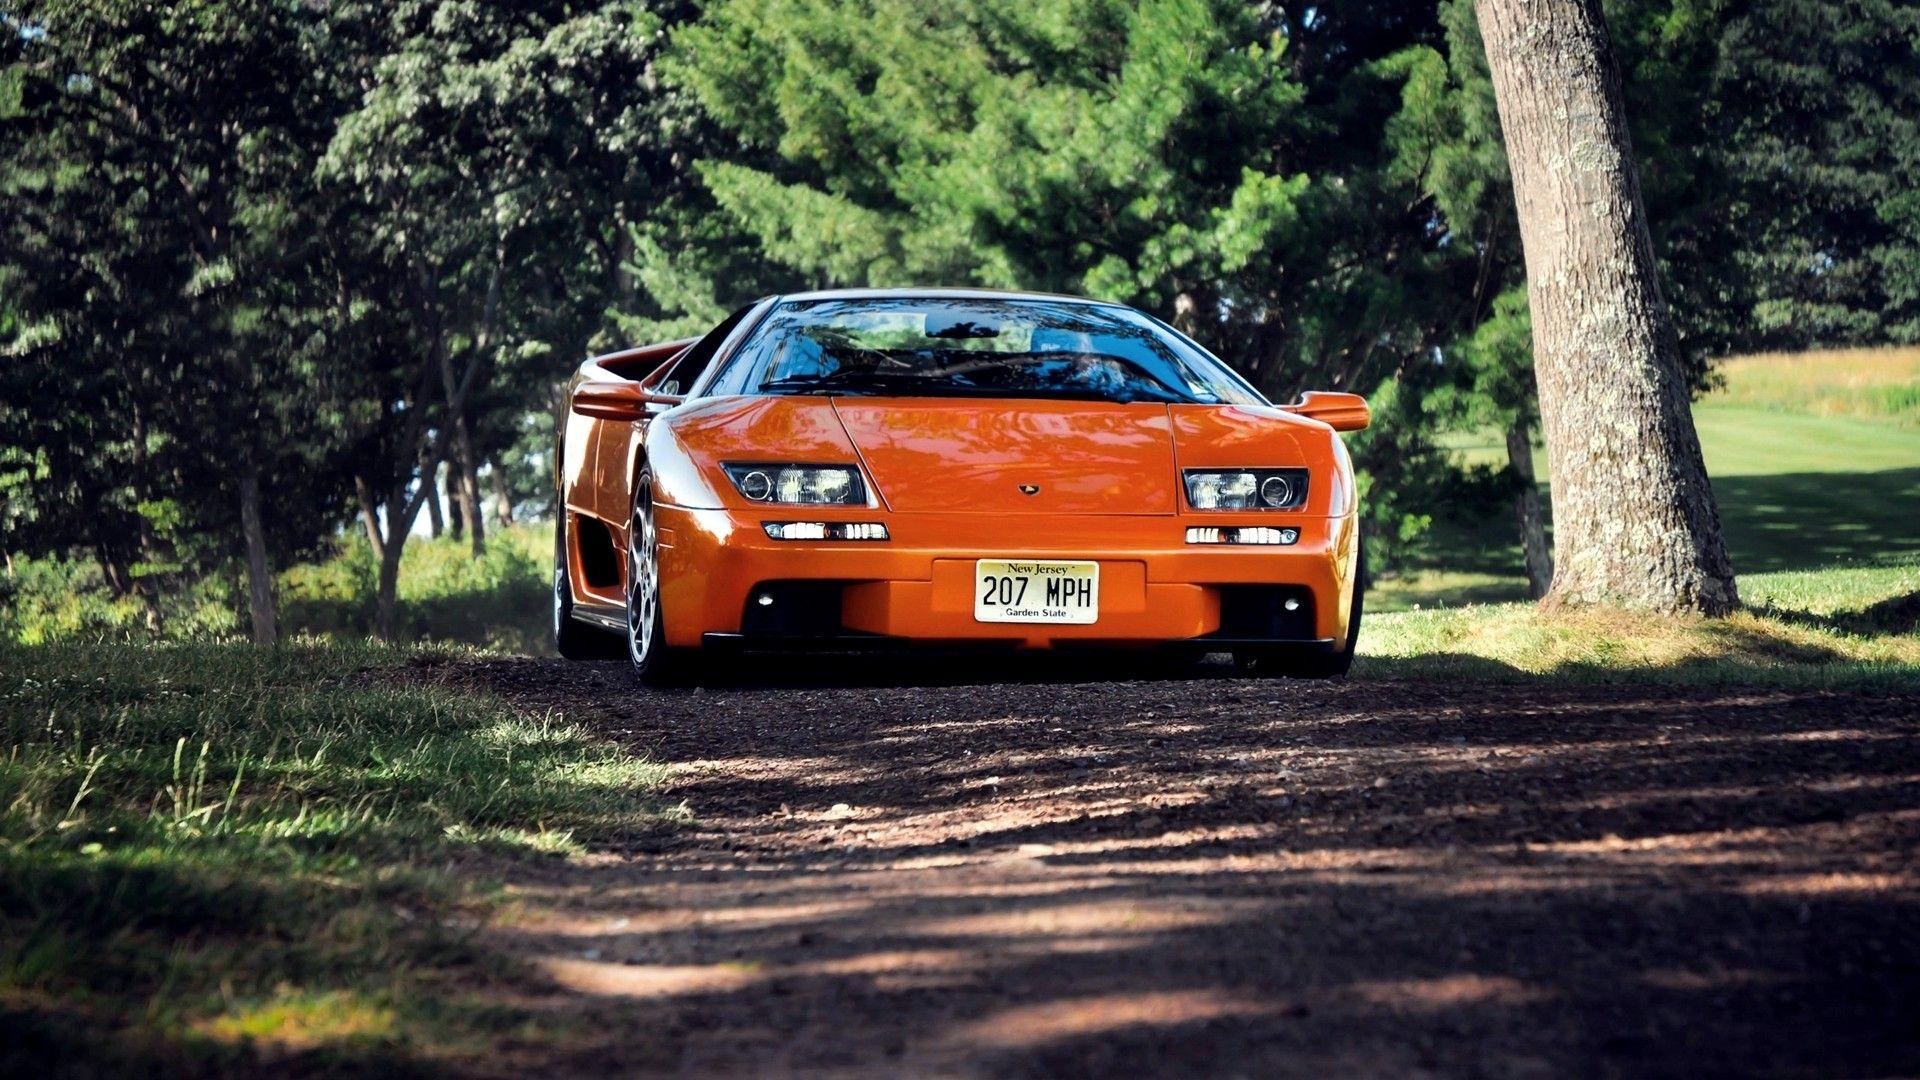 Lamborghini Diablo Orange